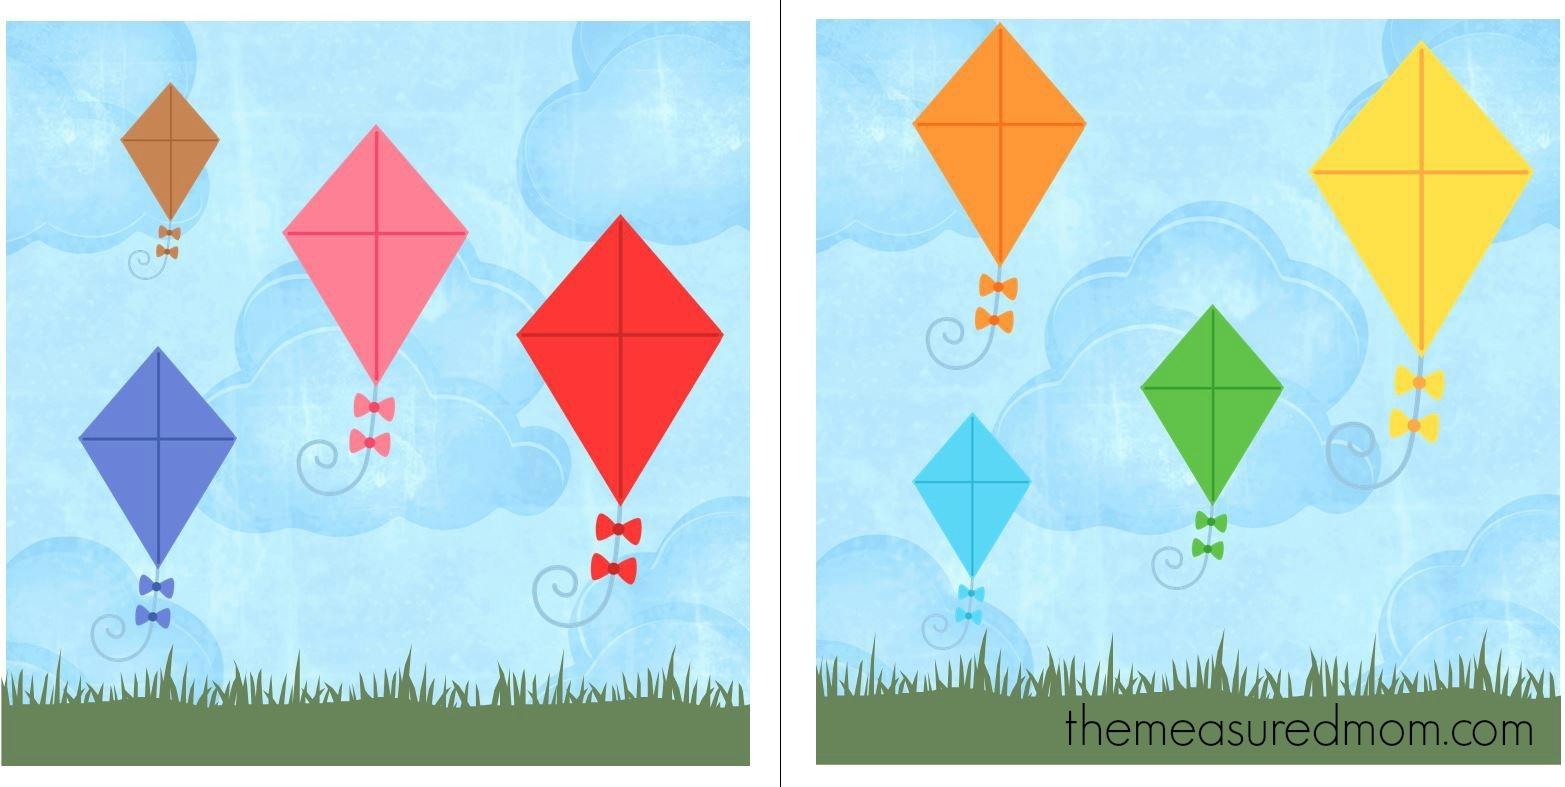 Free File Folder Game For Preschoolers: Kites! - The Measured Mom - Free Printable Preschool Folder Games